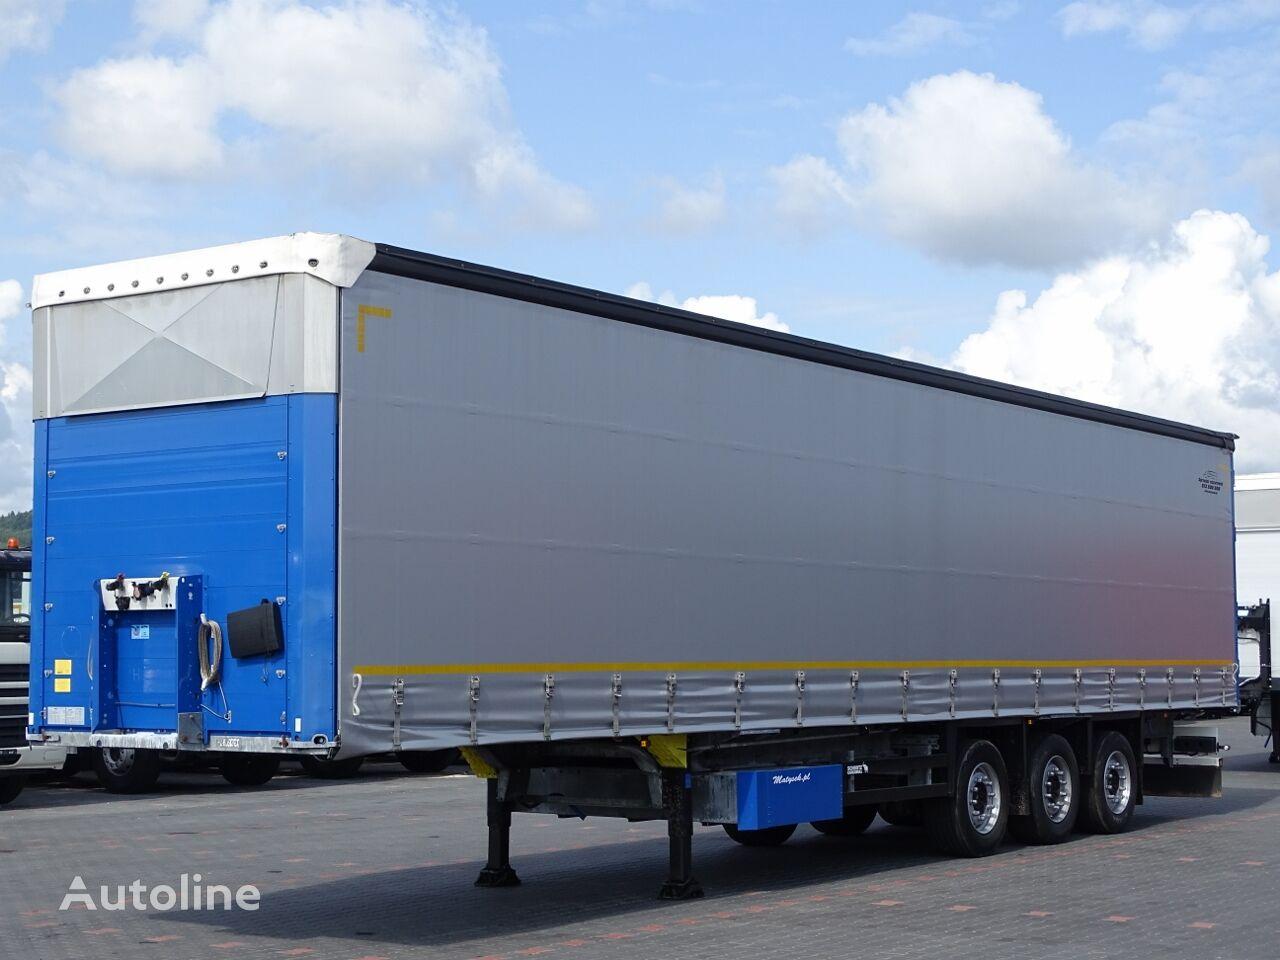 SCHMITZ CARGOBULL CURTAINSIDER / STANDARD / LIFTED AXLE / 385/55 R22,5 curtain side semi-trailer